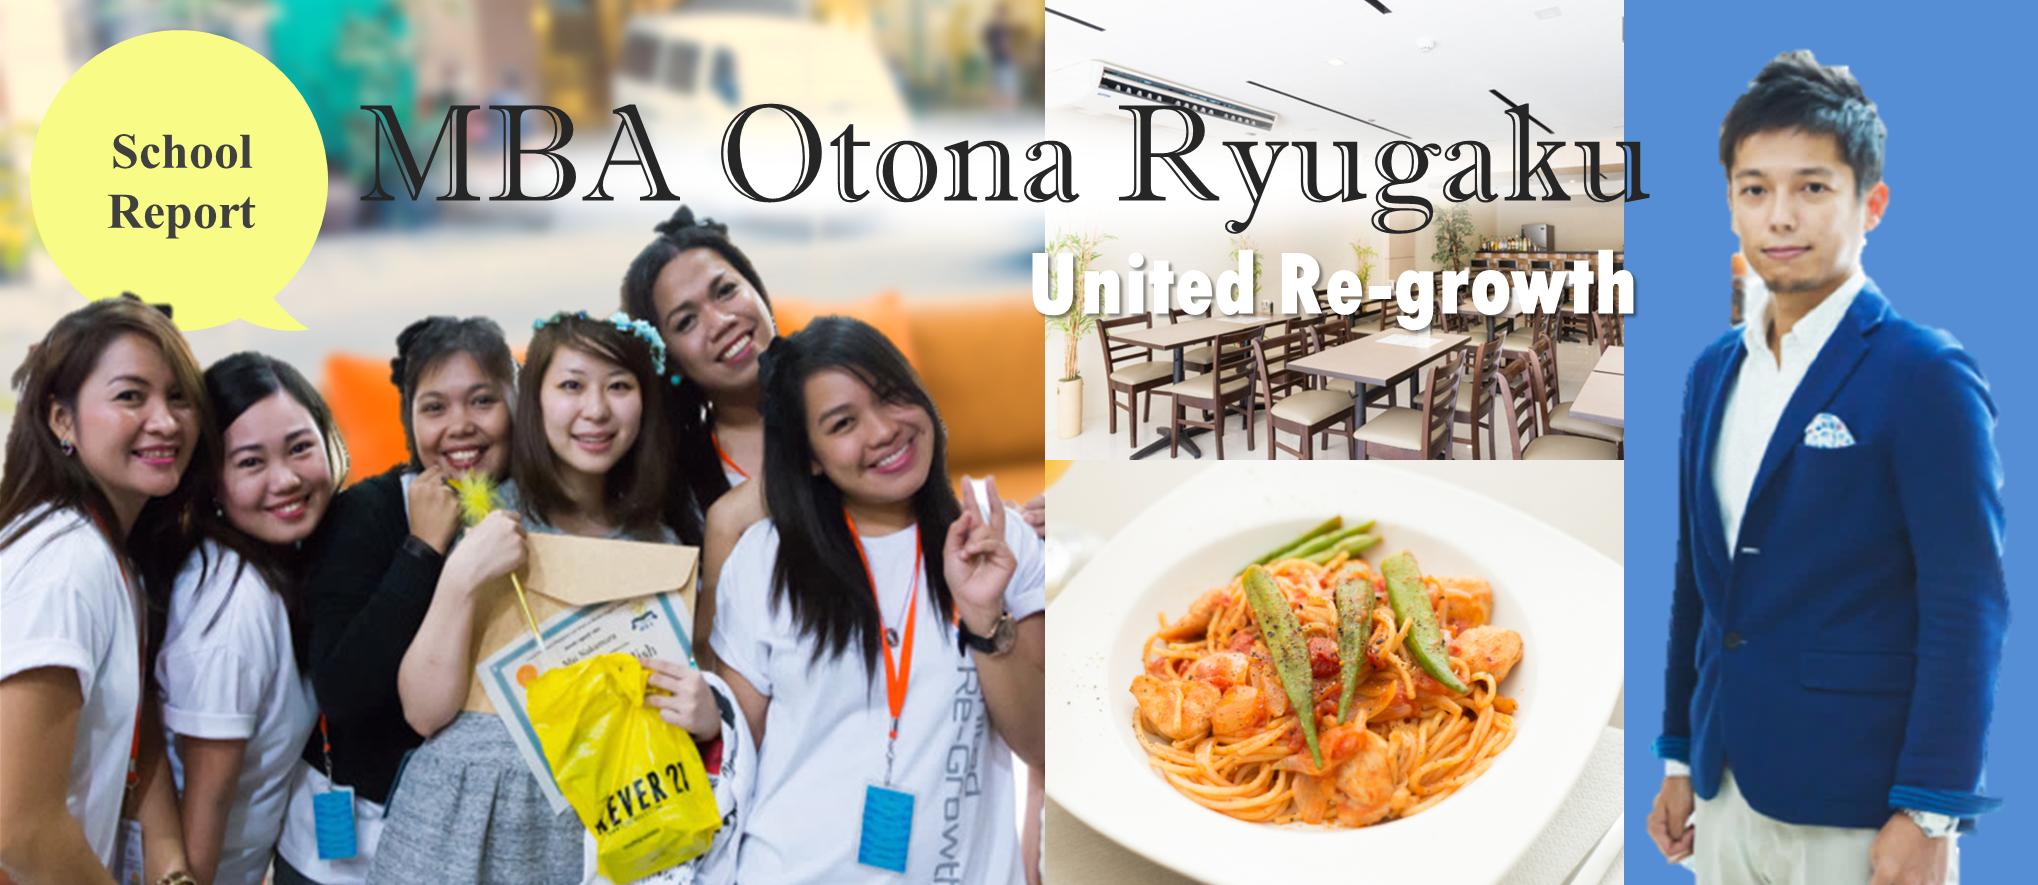 MBA_otona_ryugaku